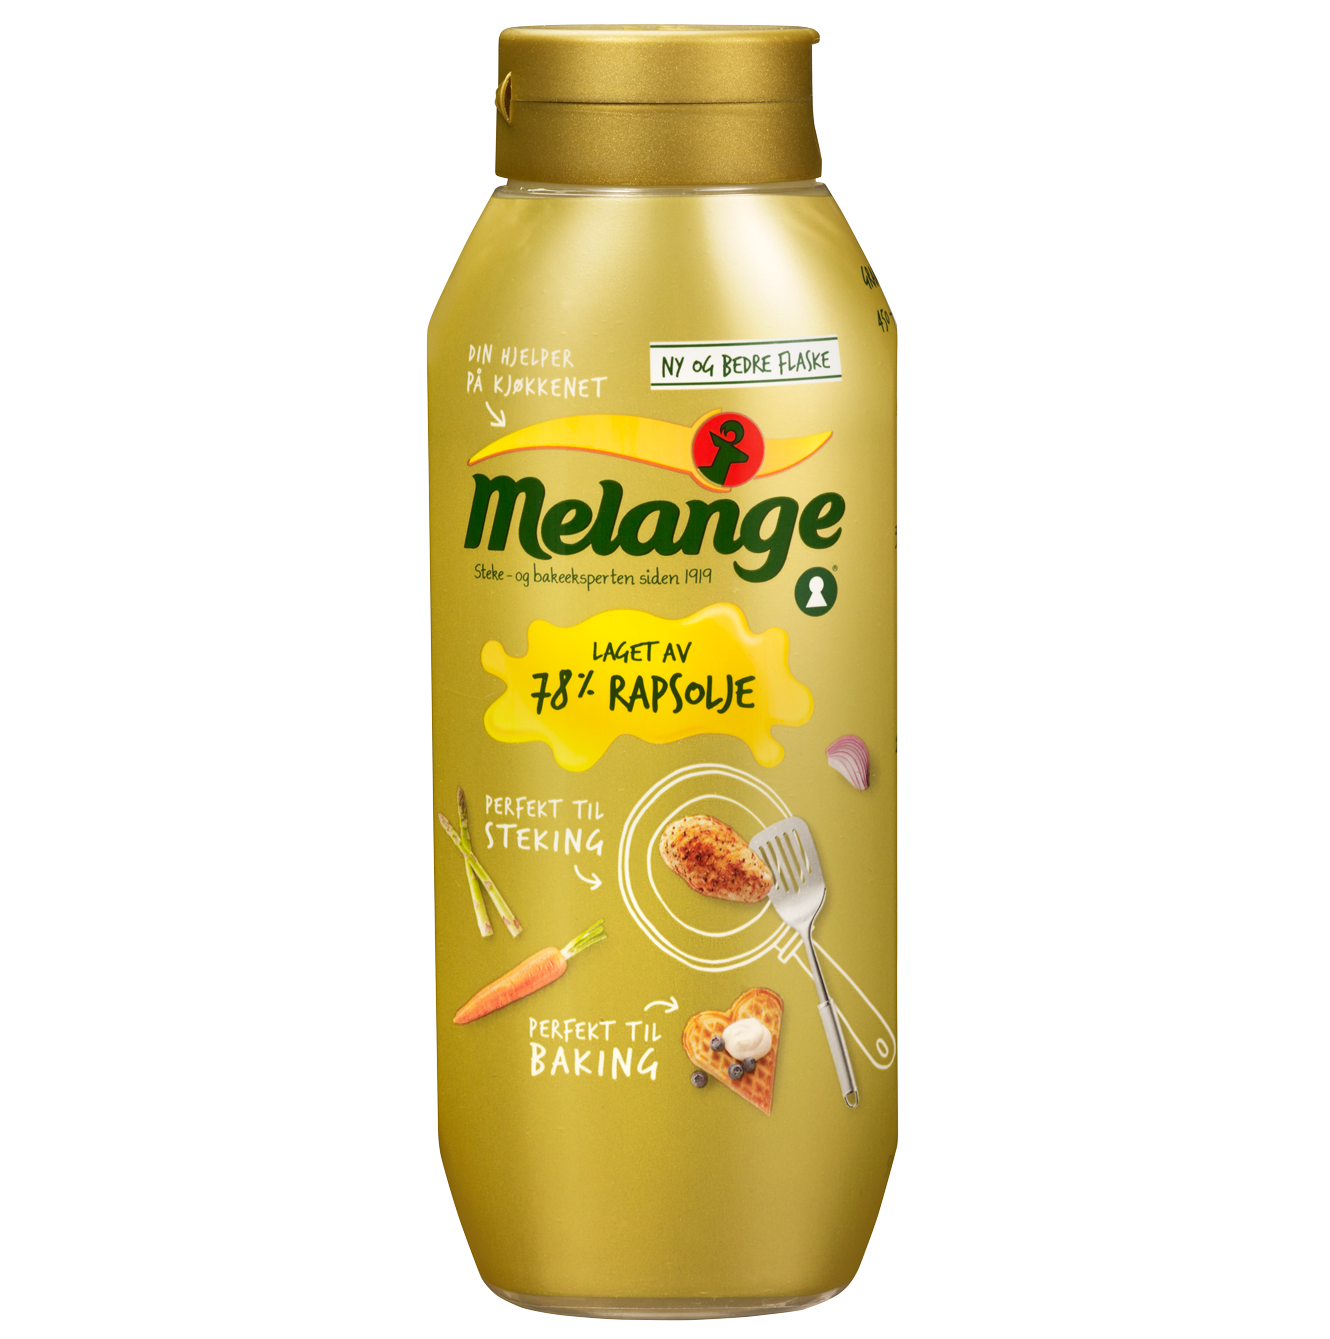 Flytende Melange